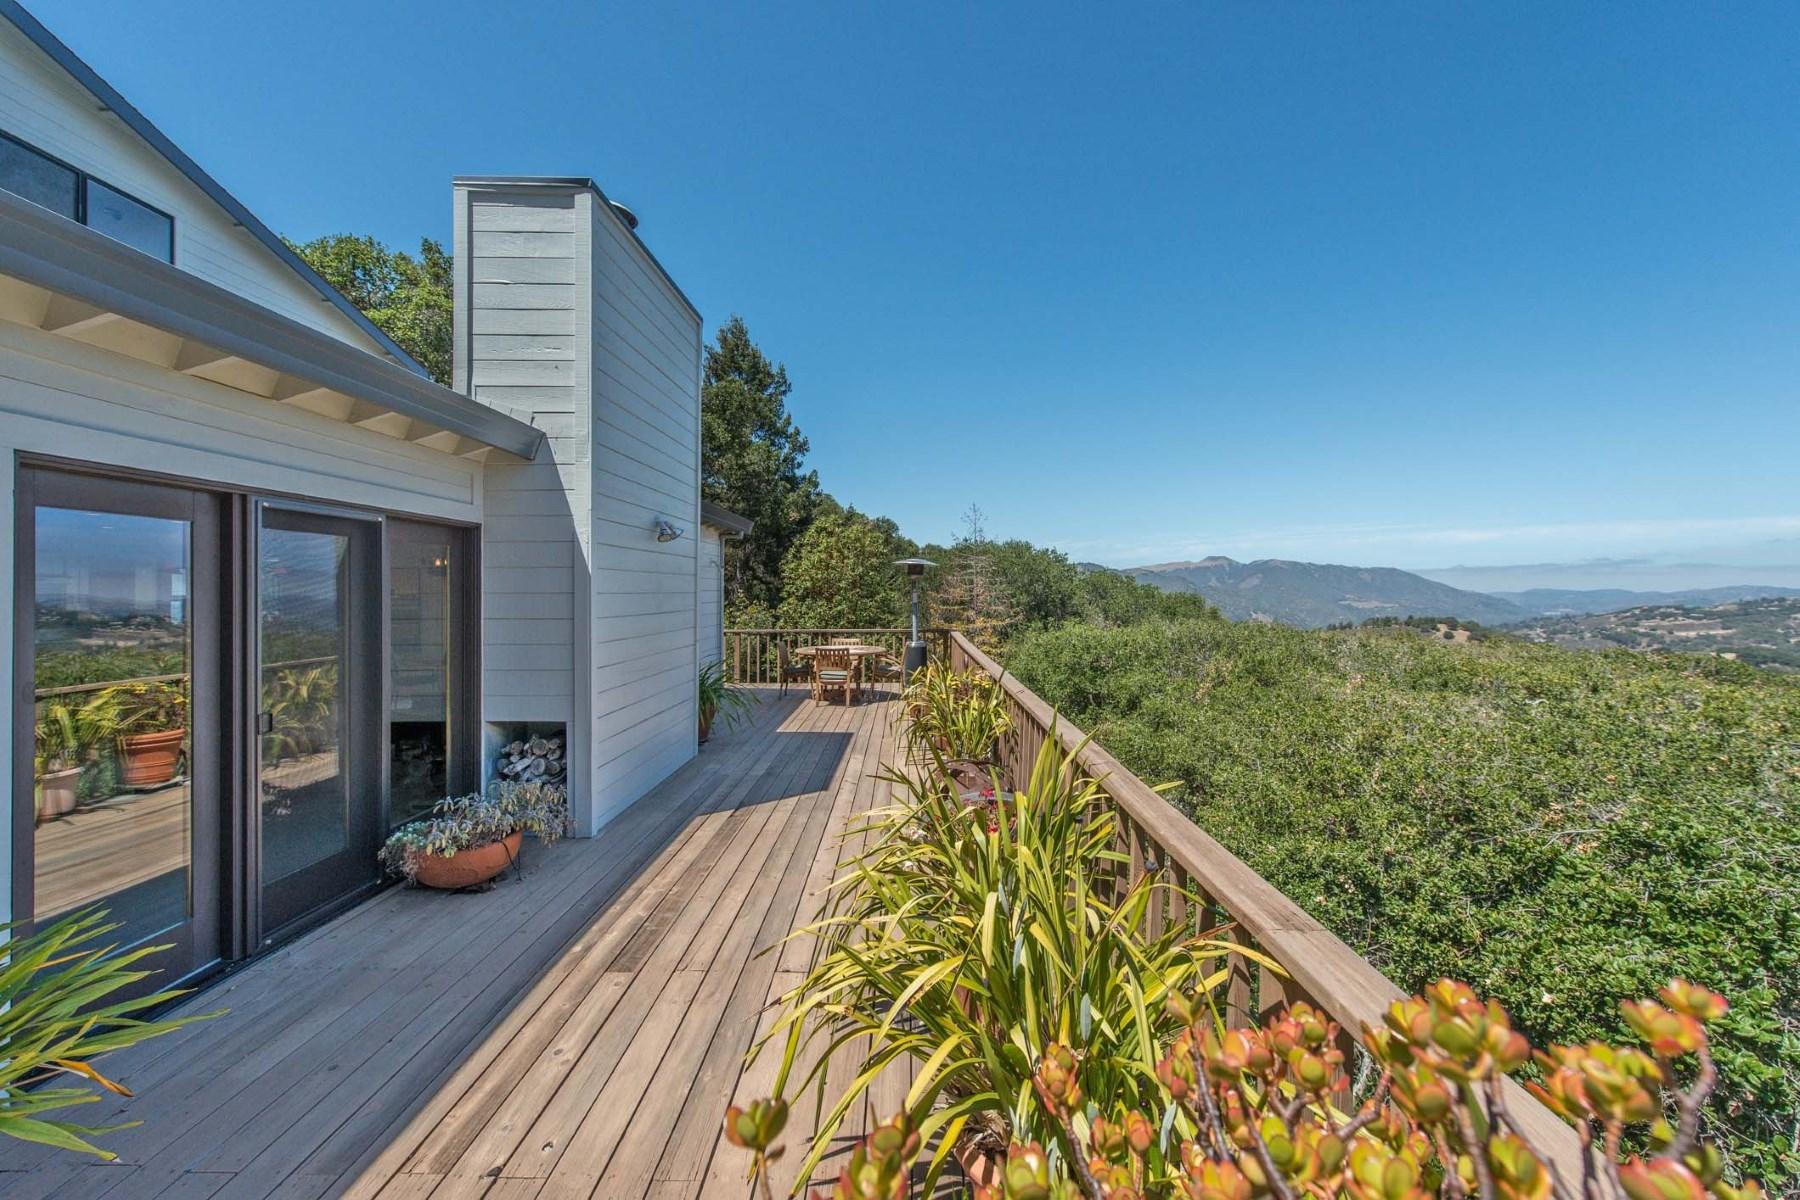 Single Family Home for Sale at Views and Privacy 15467 Via La Gitana Carmel Valley, California, 93924 United States